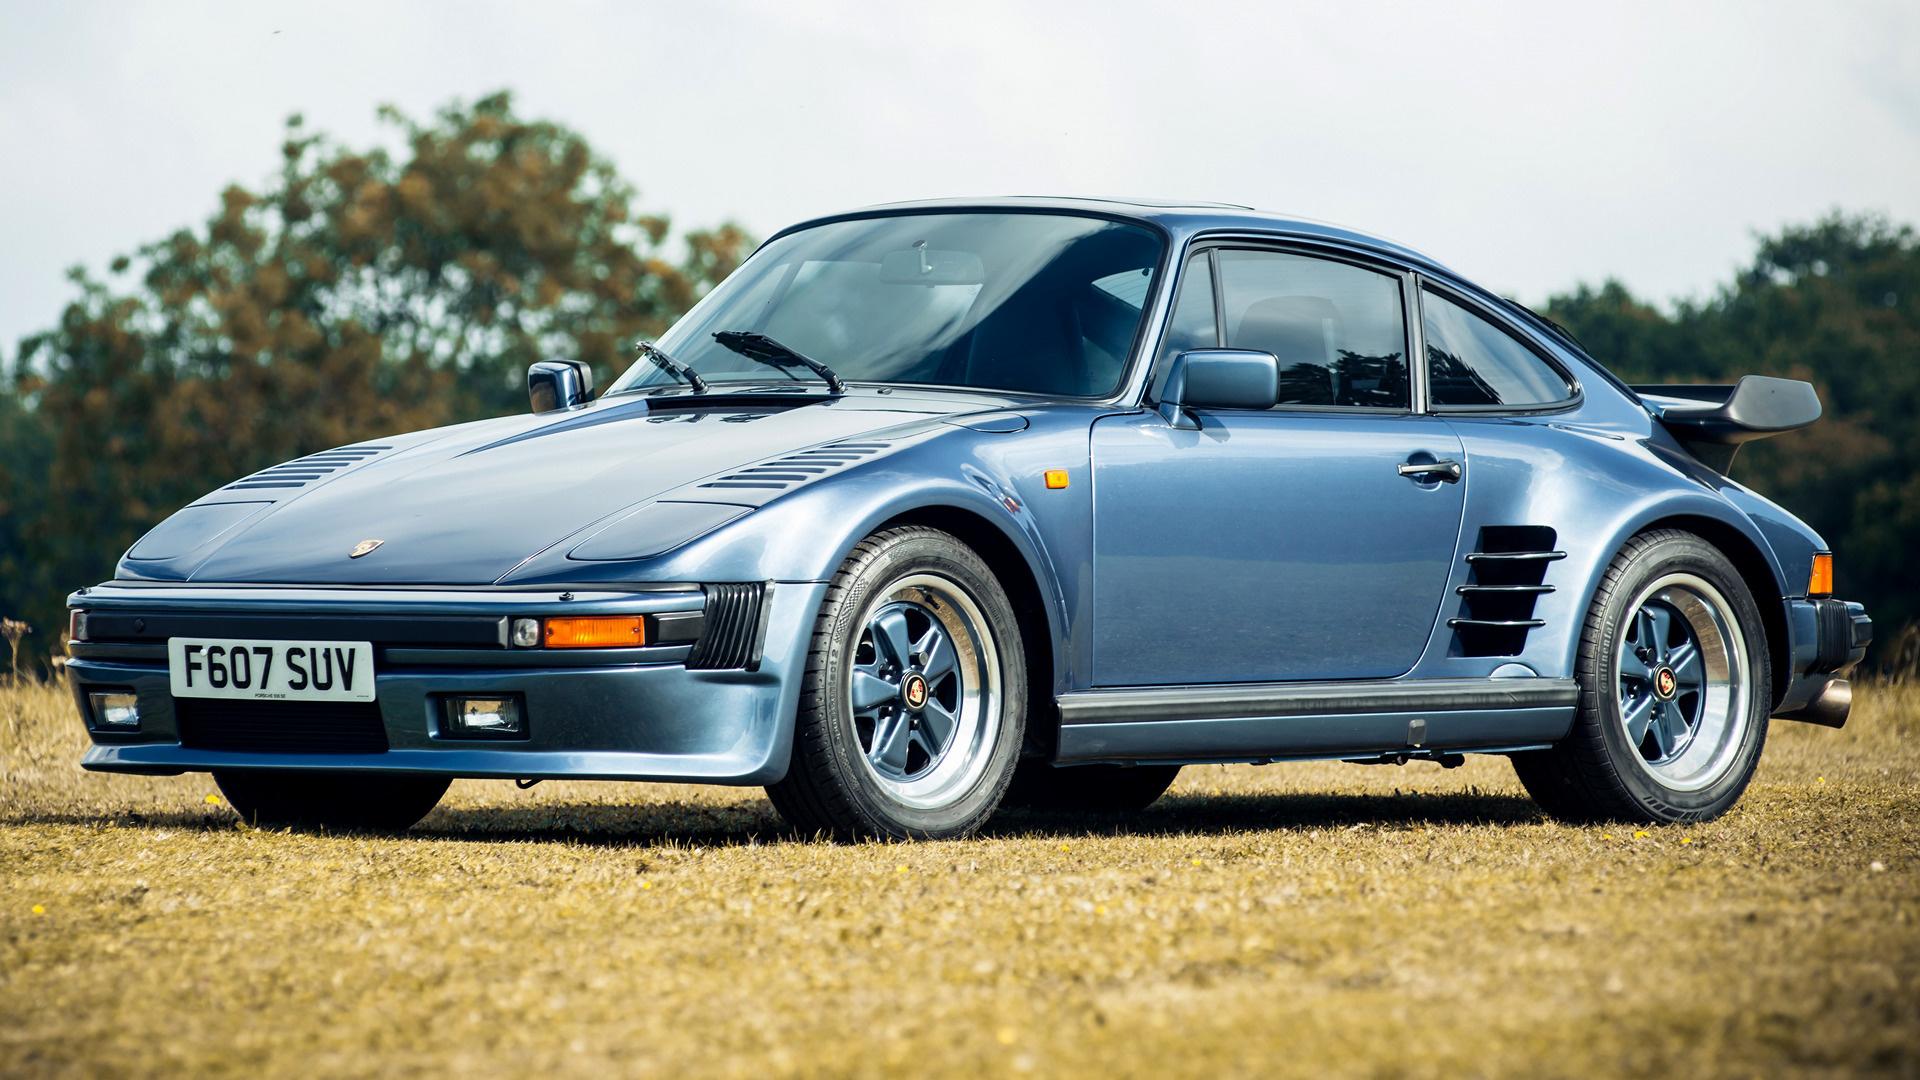 Porsche 911 Turbo Se Slantnose 1989 Uk Wallpapers And Hd